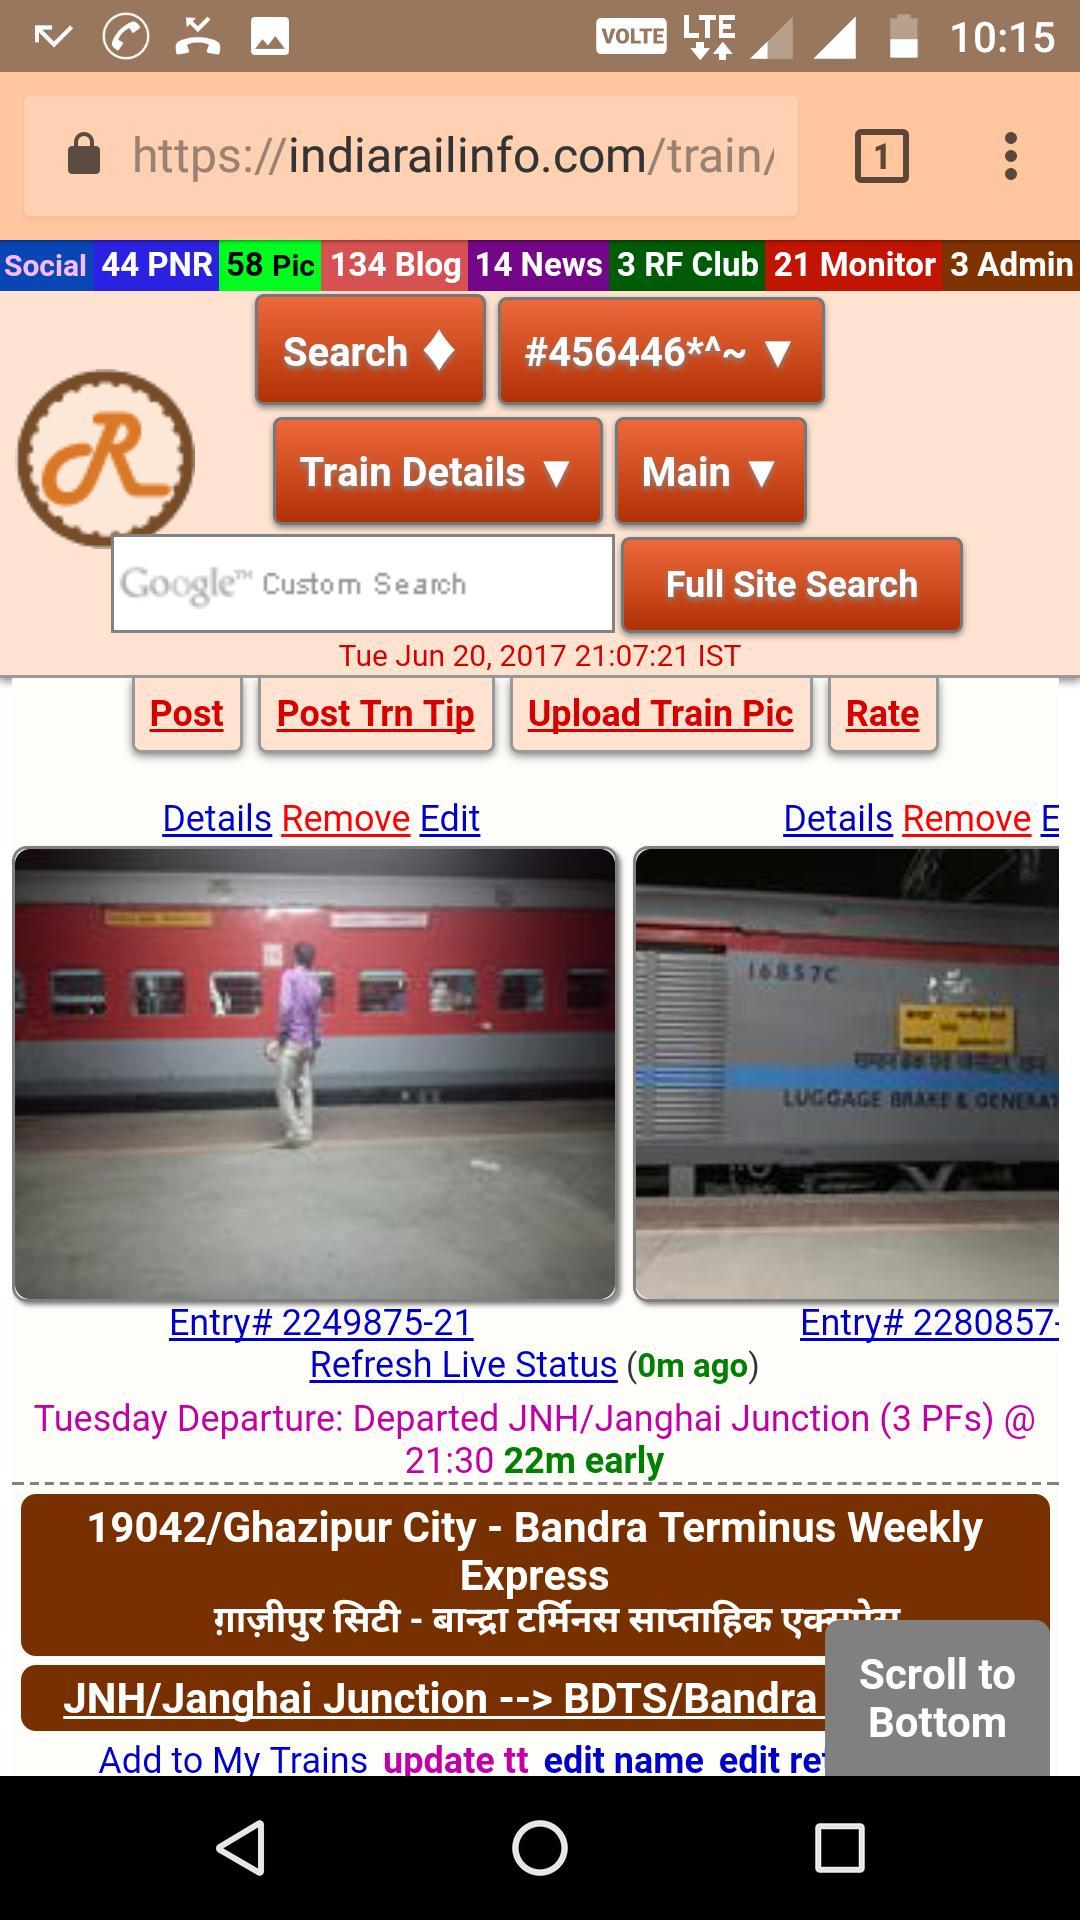 IRI Picture & Video Gallery - 2 - Railway Enquiry